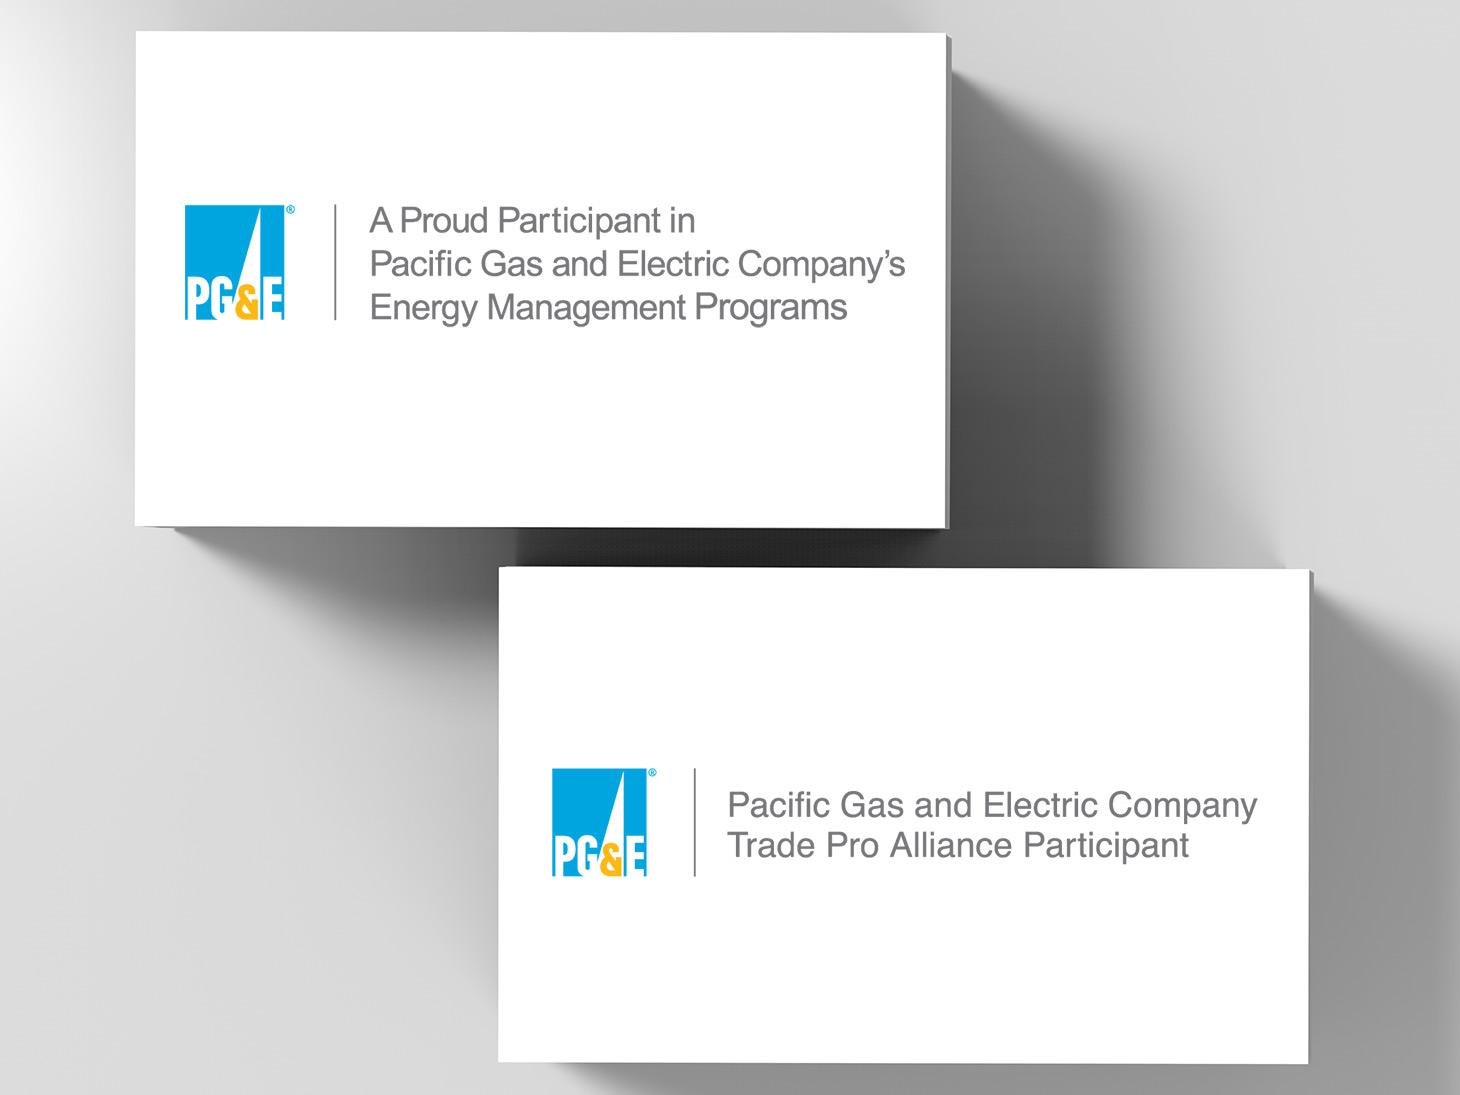 Trade Professional Alliance Co-Marketing Program